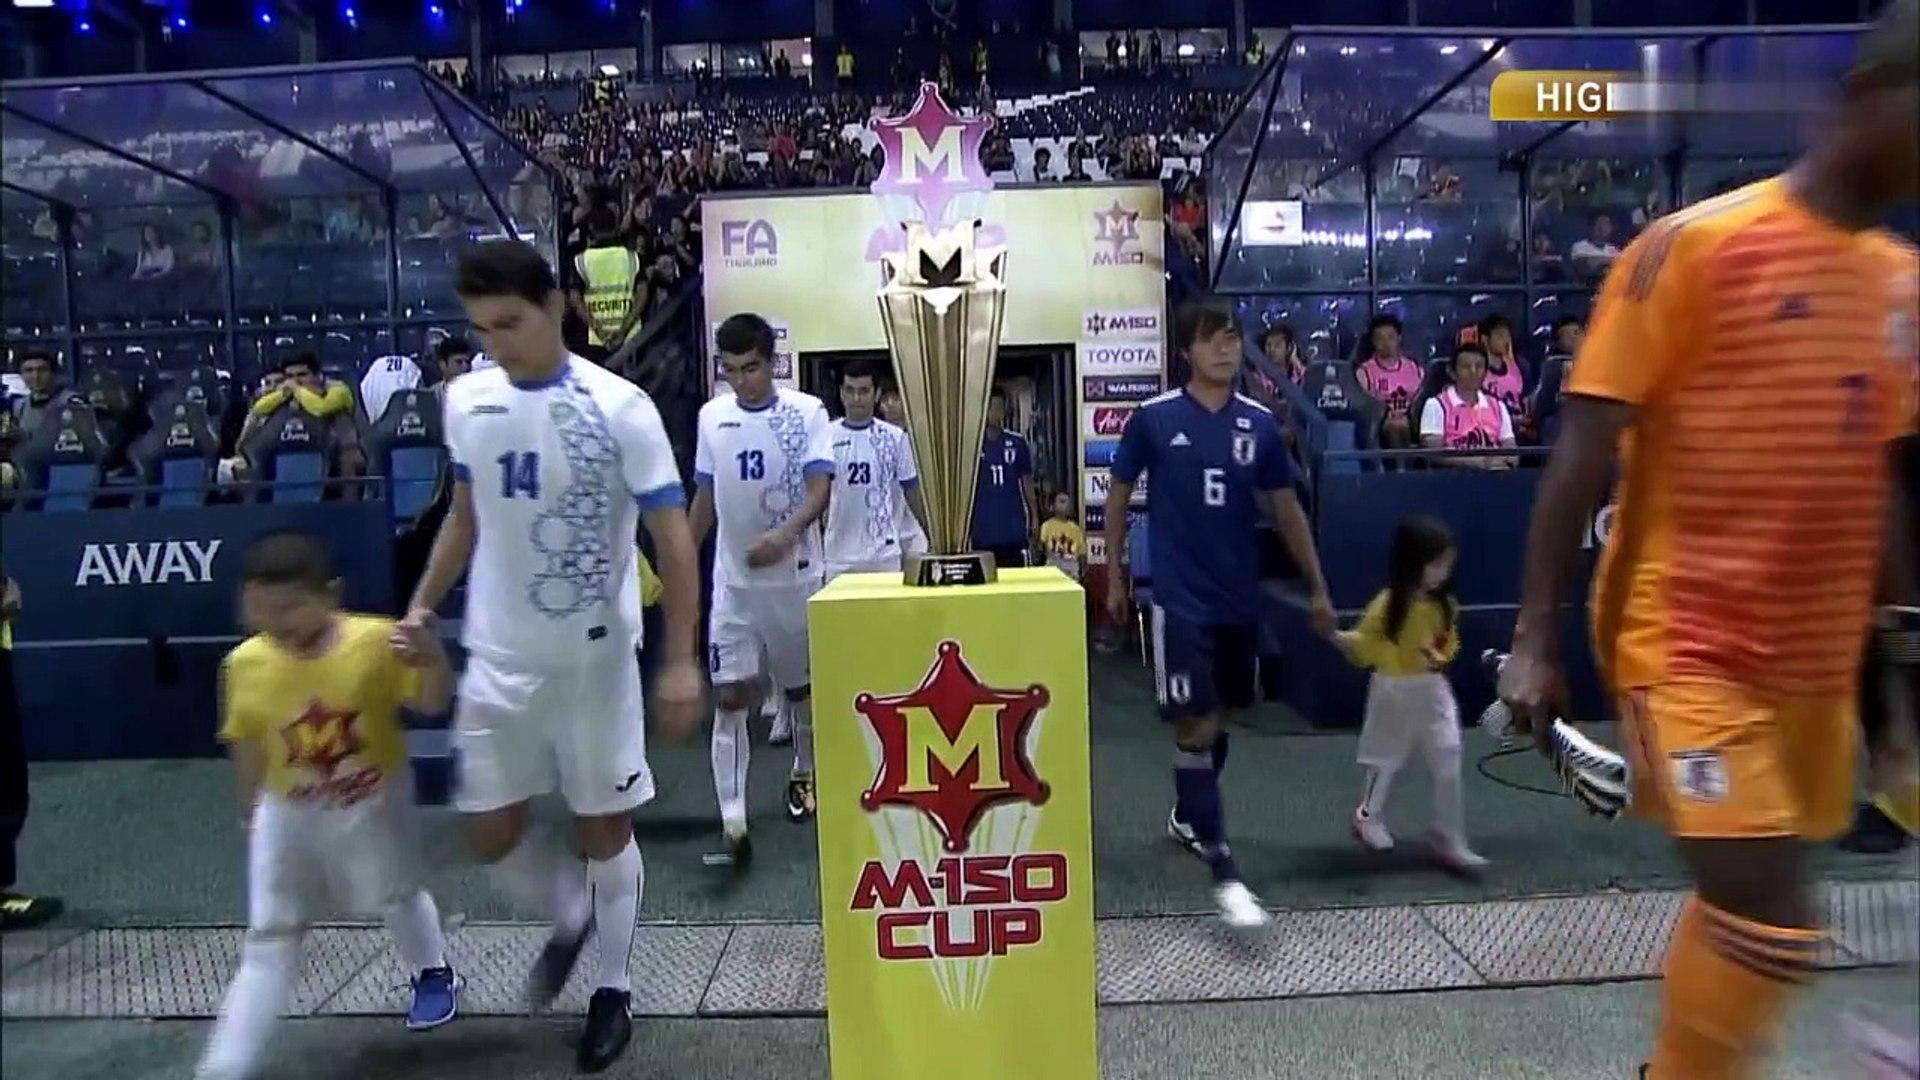 U-20 Japan x U-23 Uzbekistan 2017/12/15 Final Football M-150 Cup